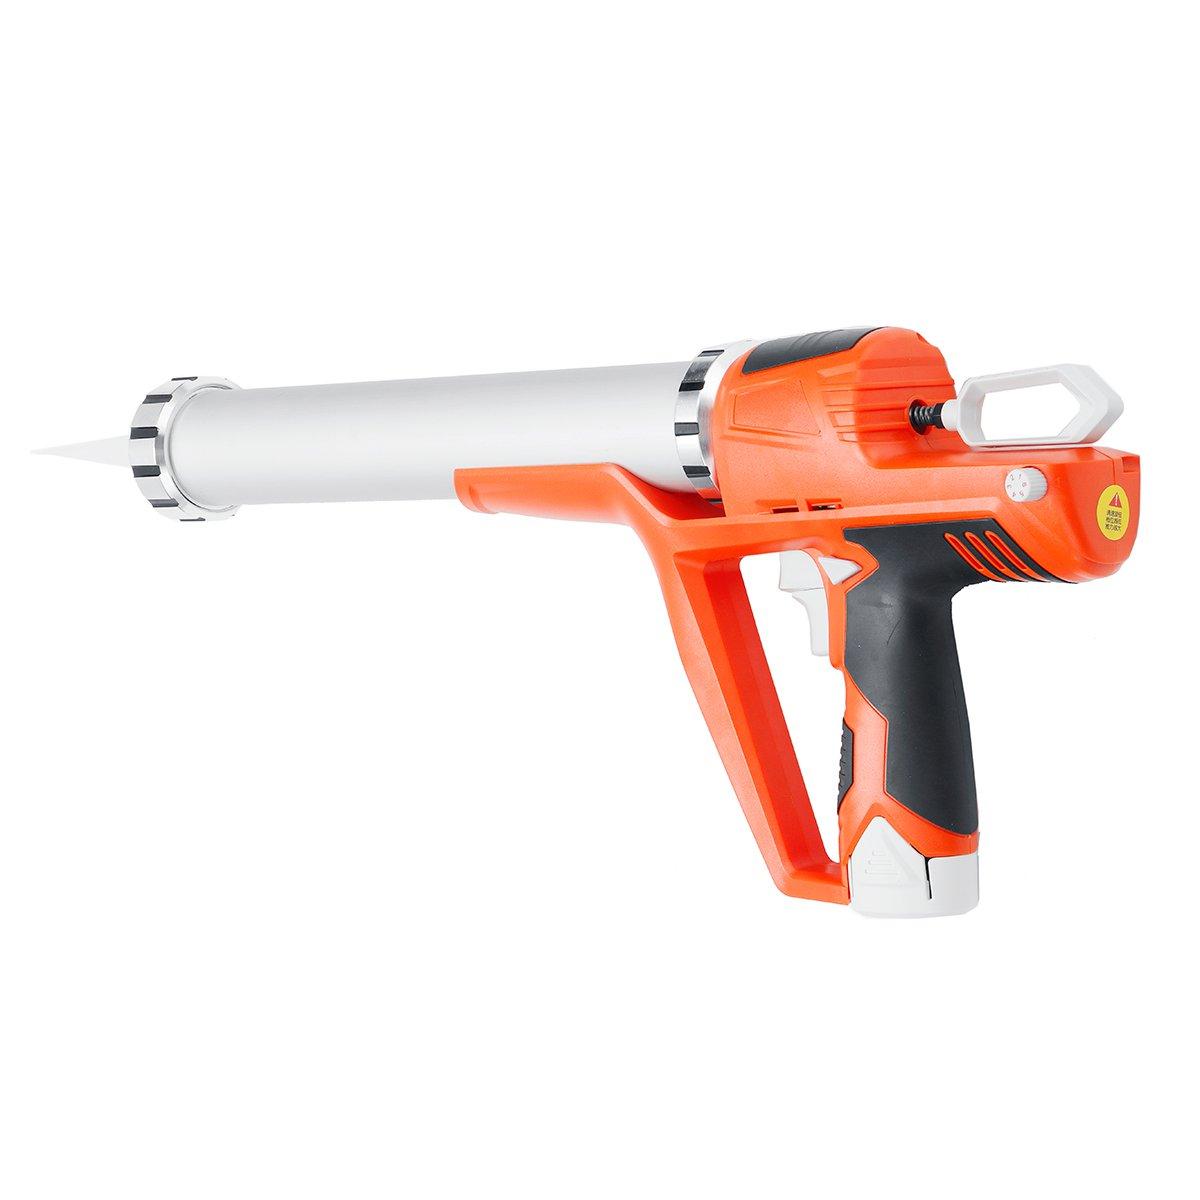 Pistolas de calafetagem sem fio elétricas 1.5ah